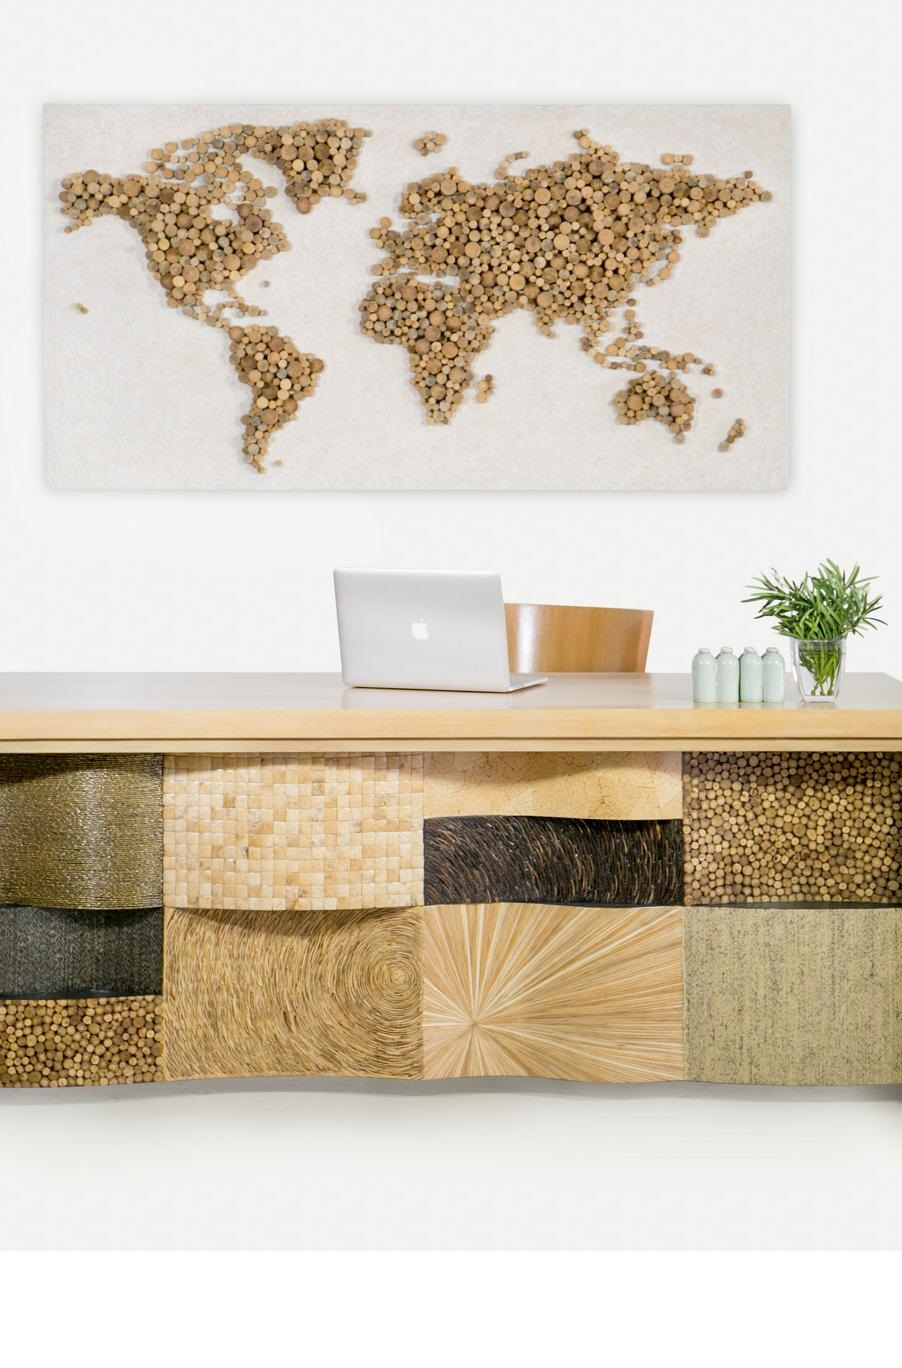 Co-Creative Studio, Detalia Aurora, World Map Wall Art, Rattan Poles, Upcycled A.jpg